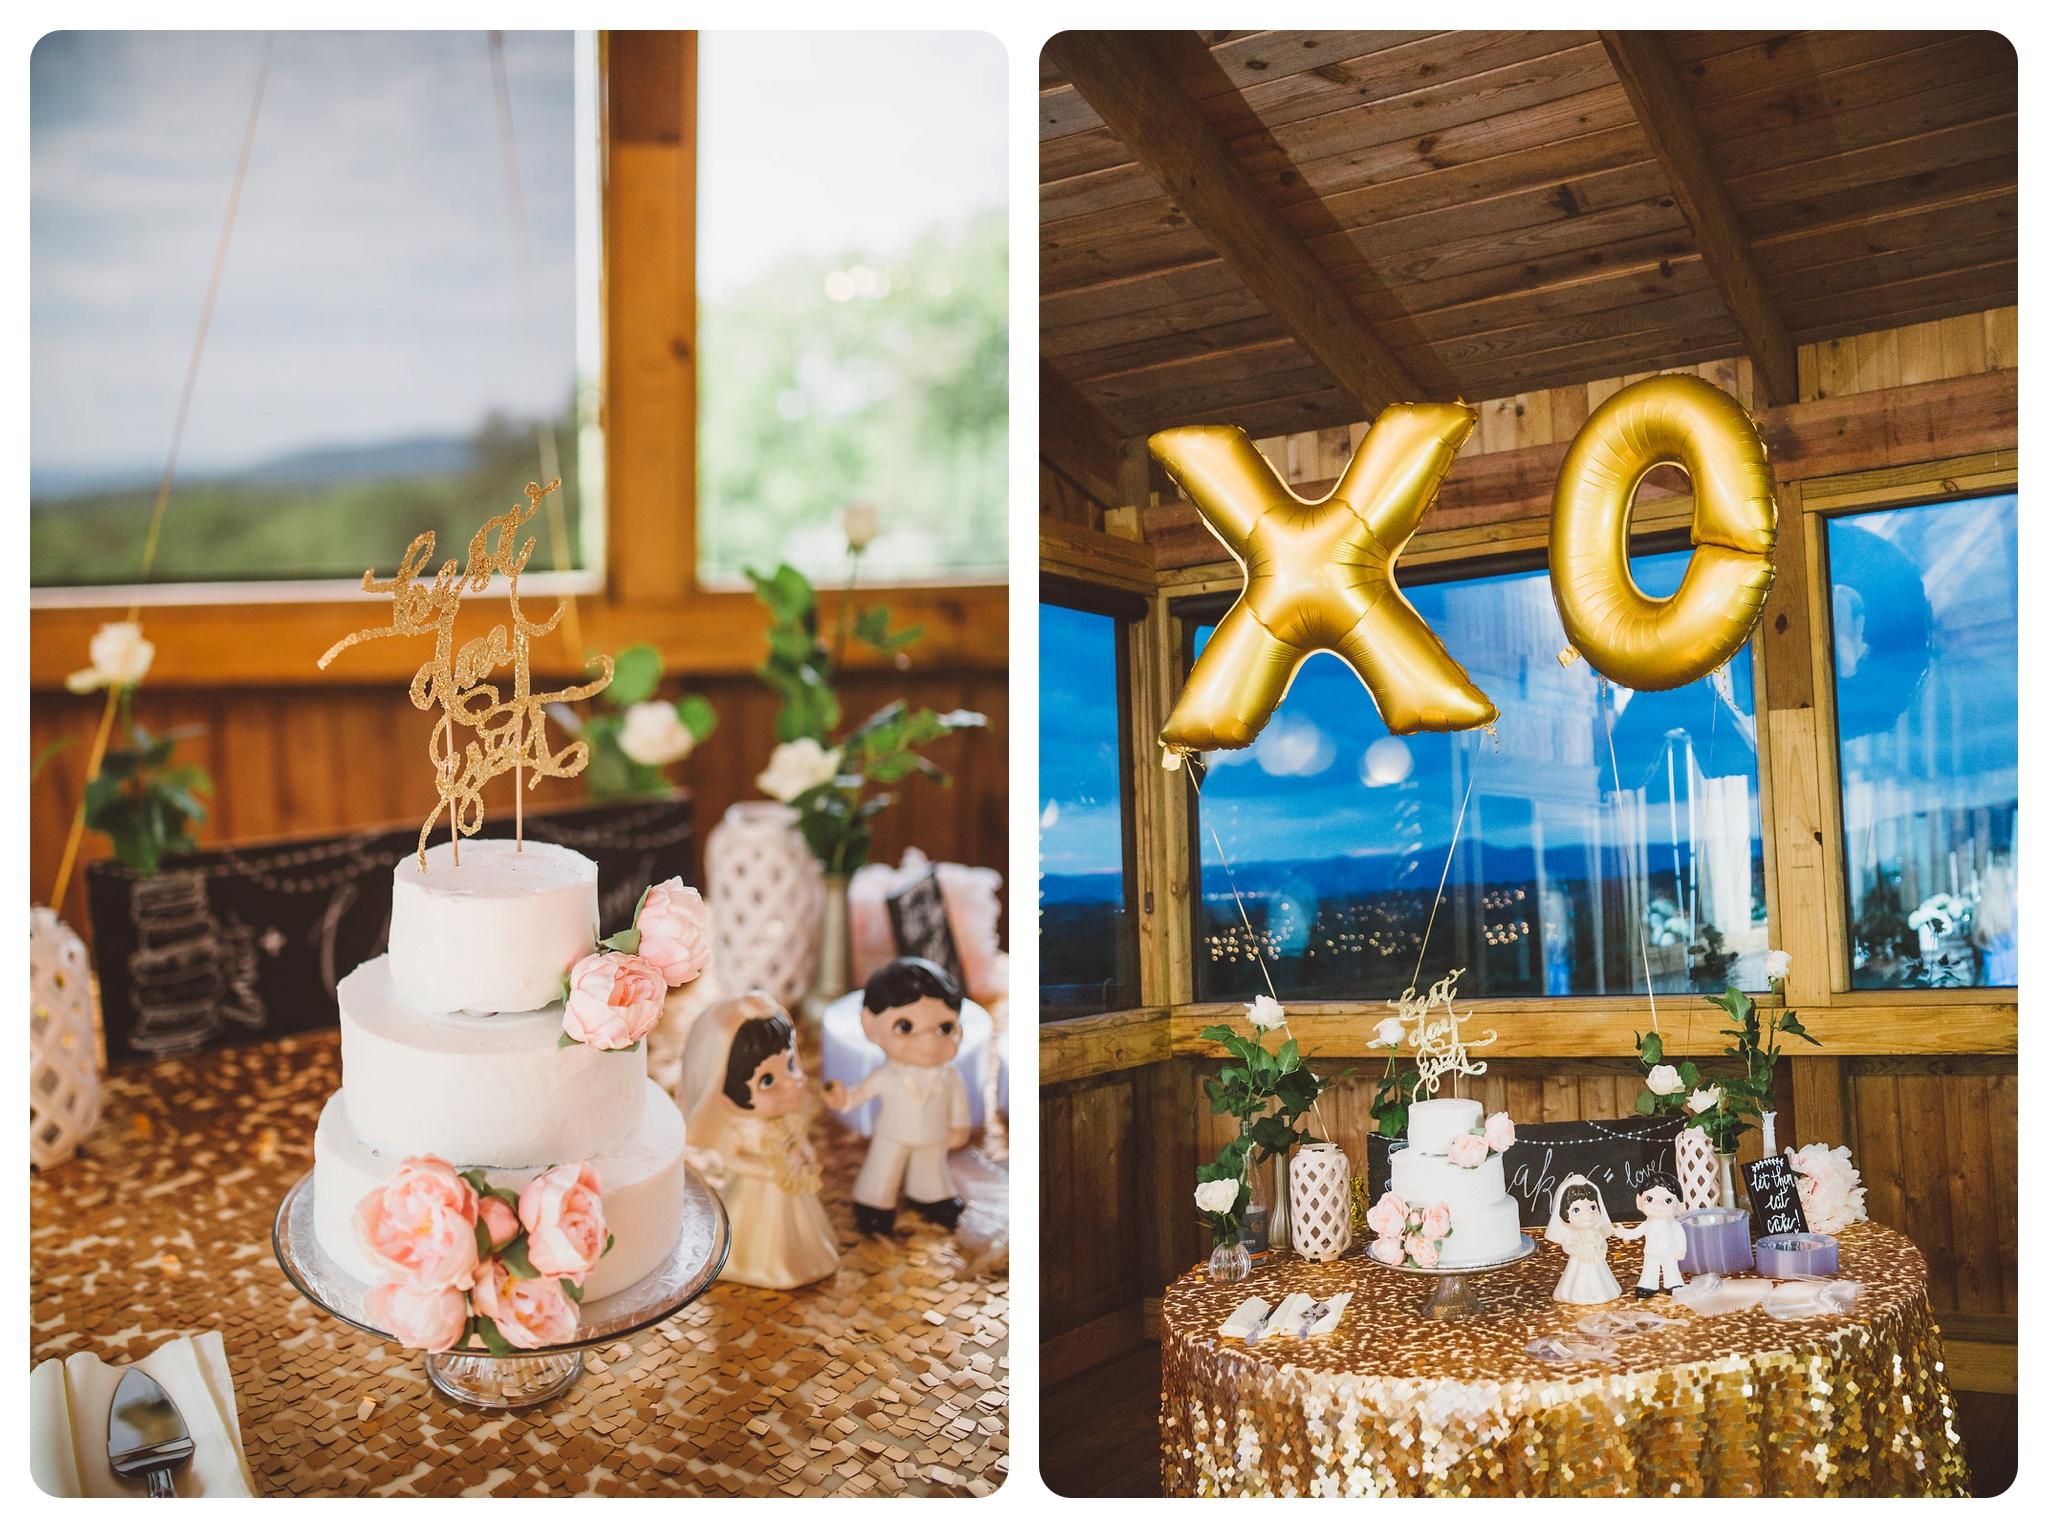 Braeloch-Weddings-Wedding-Photographer-Pat-Cori-Photography-042.jpg